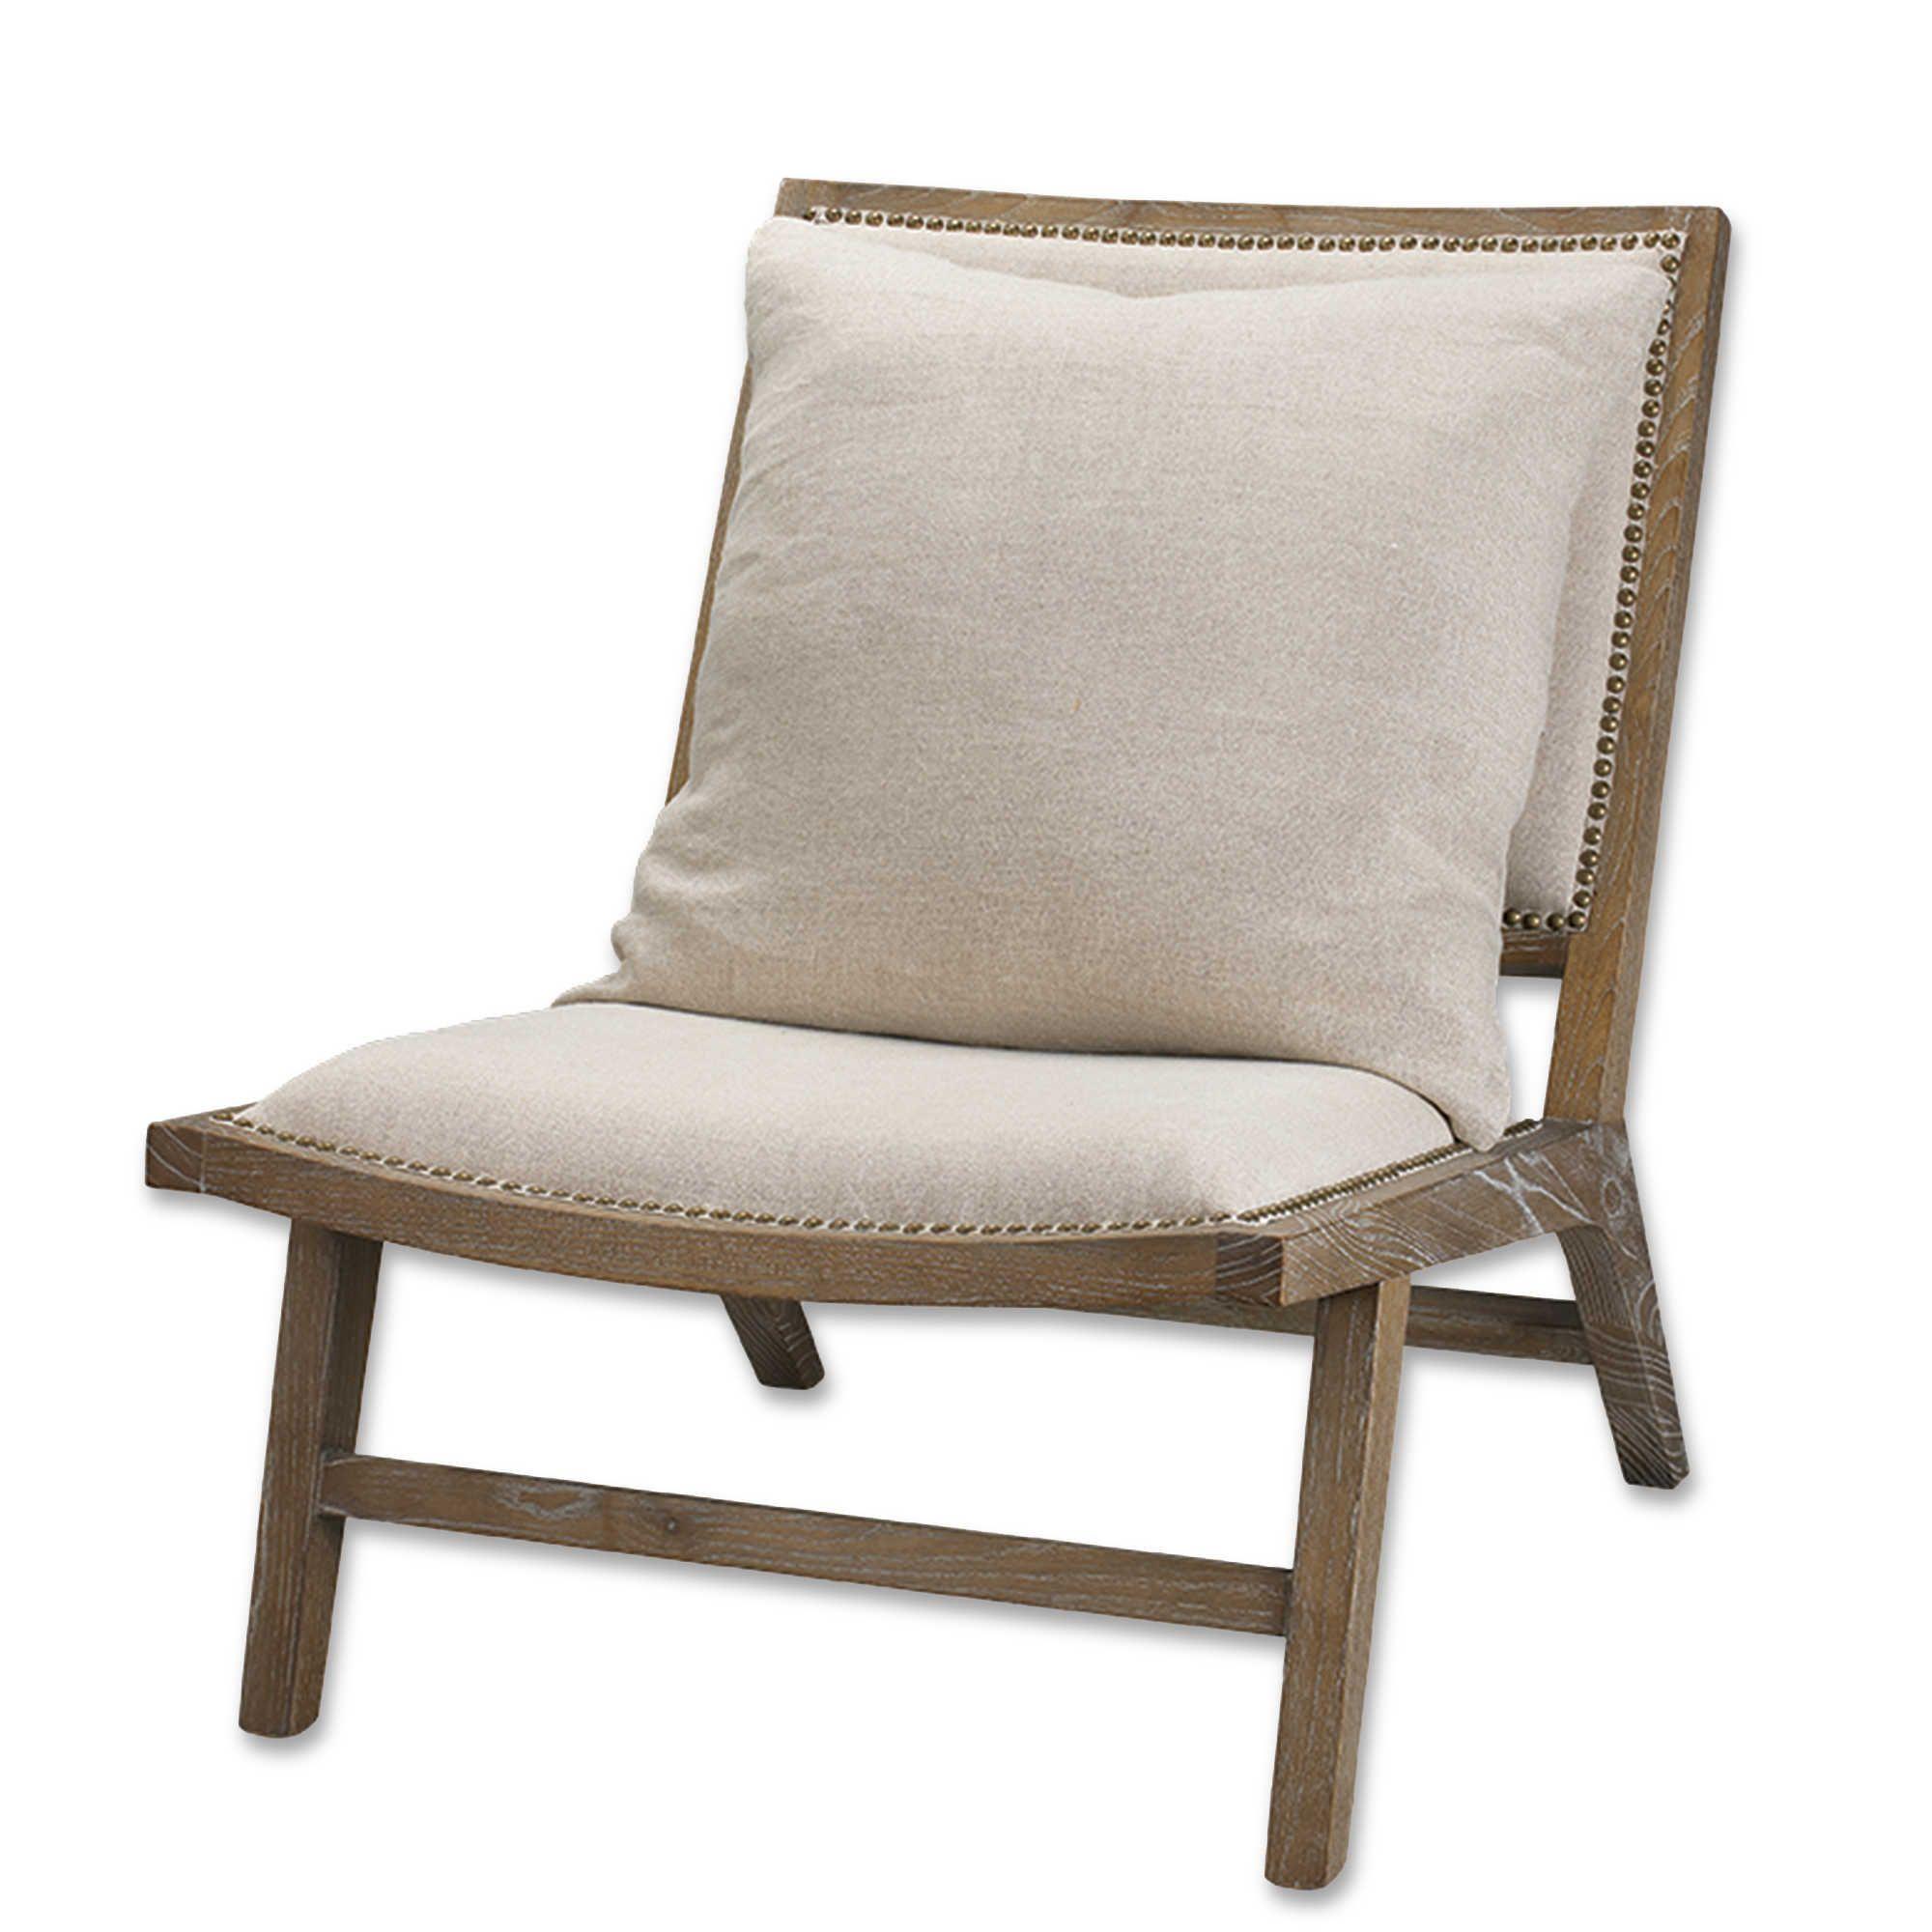 Baldwin chair in grey bed bath beyond grey wood